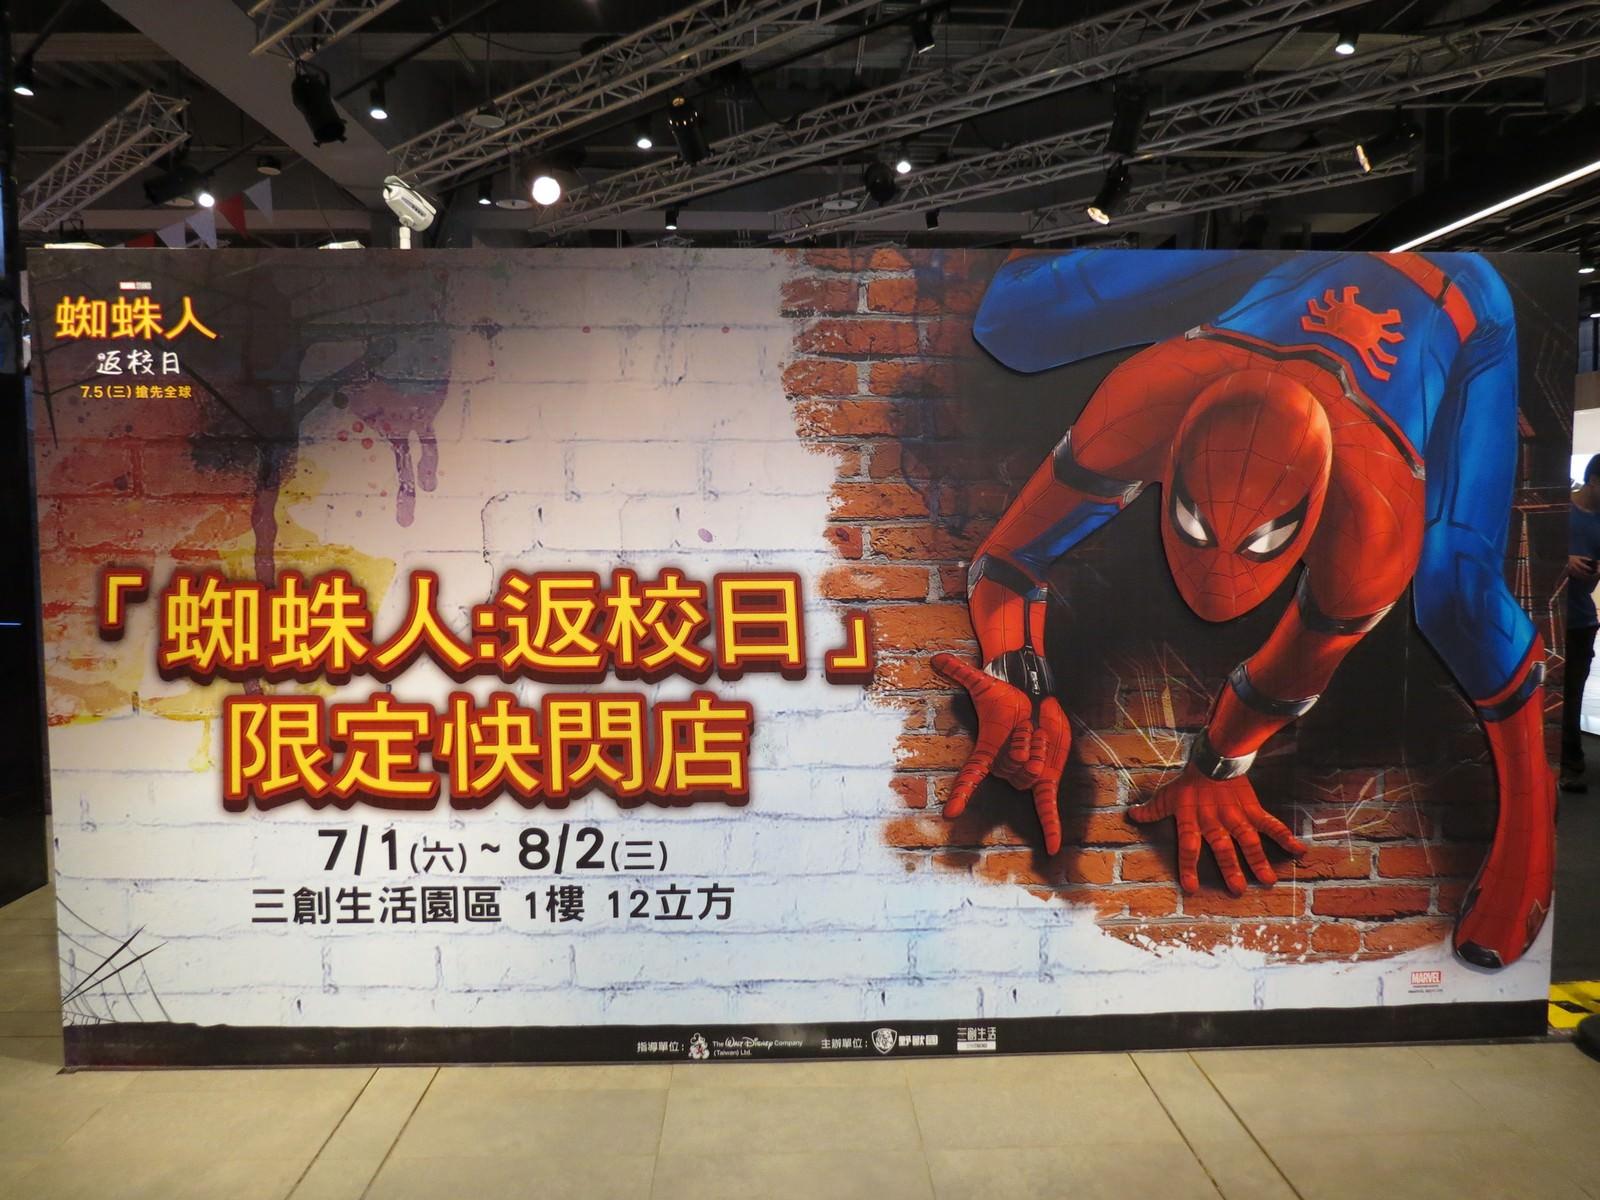 Movie, Spider-Man: Homecoming(美國, 2017年) / 蜘蛛人:返校日(台灣) / 蜘蛛侠:英雄归来(中國) / 蜘蛛俠:強勢回歸(香港), 電影主題展, 「蜘蛛人:返校日」限定快閃店